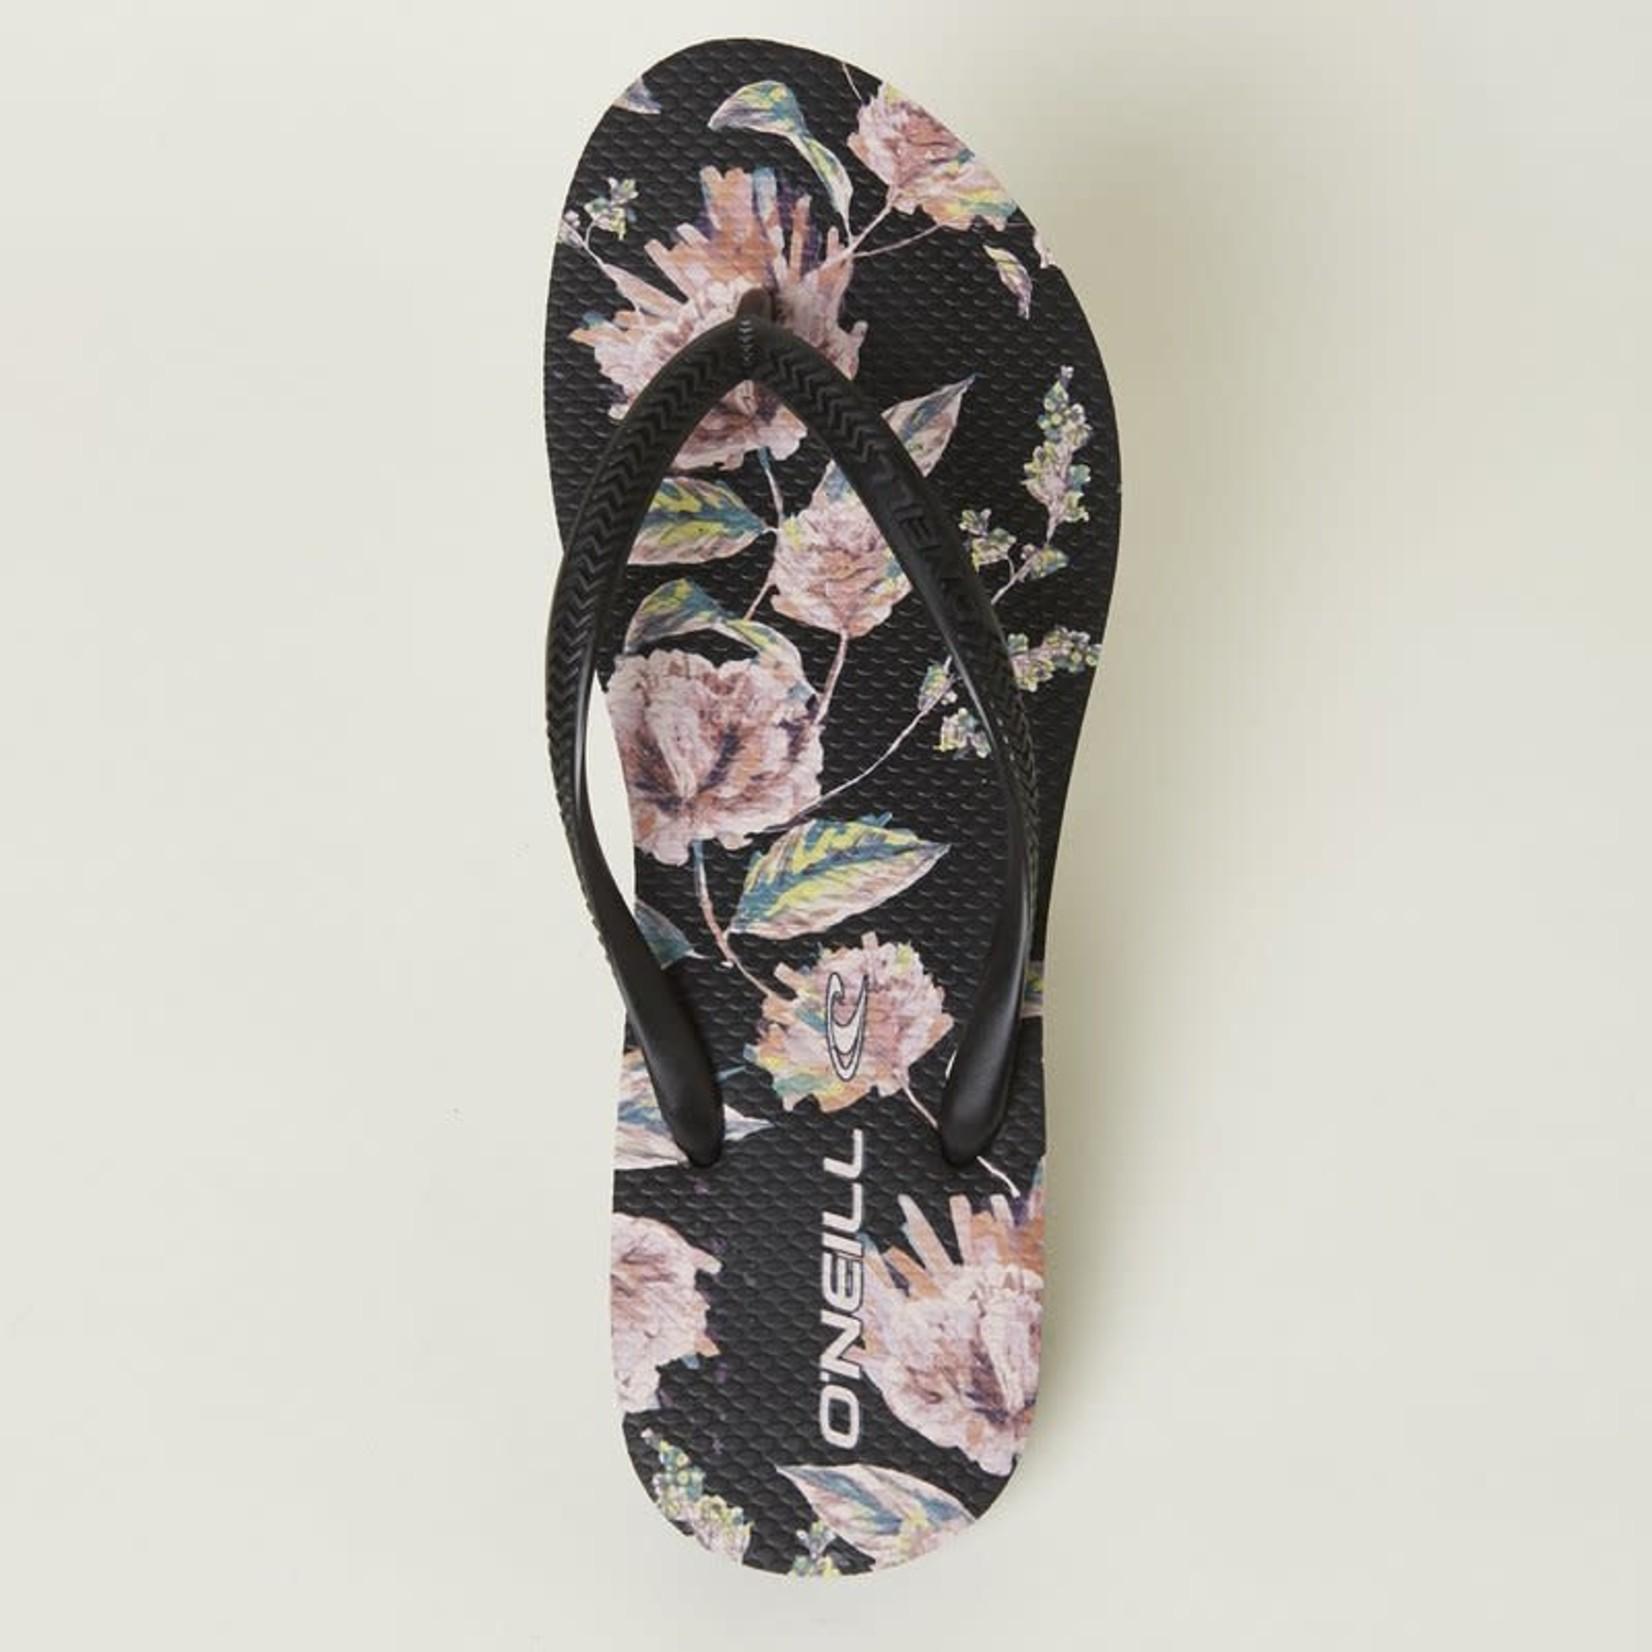 O'Neill O'Neill Solana Woman's Flip Flops.